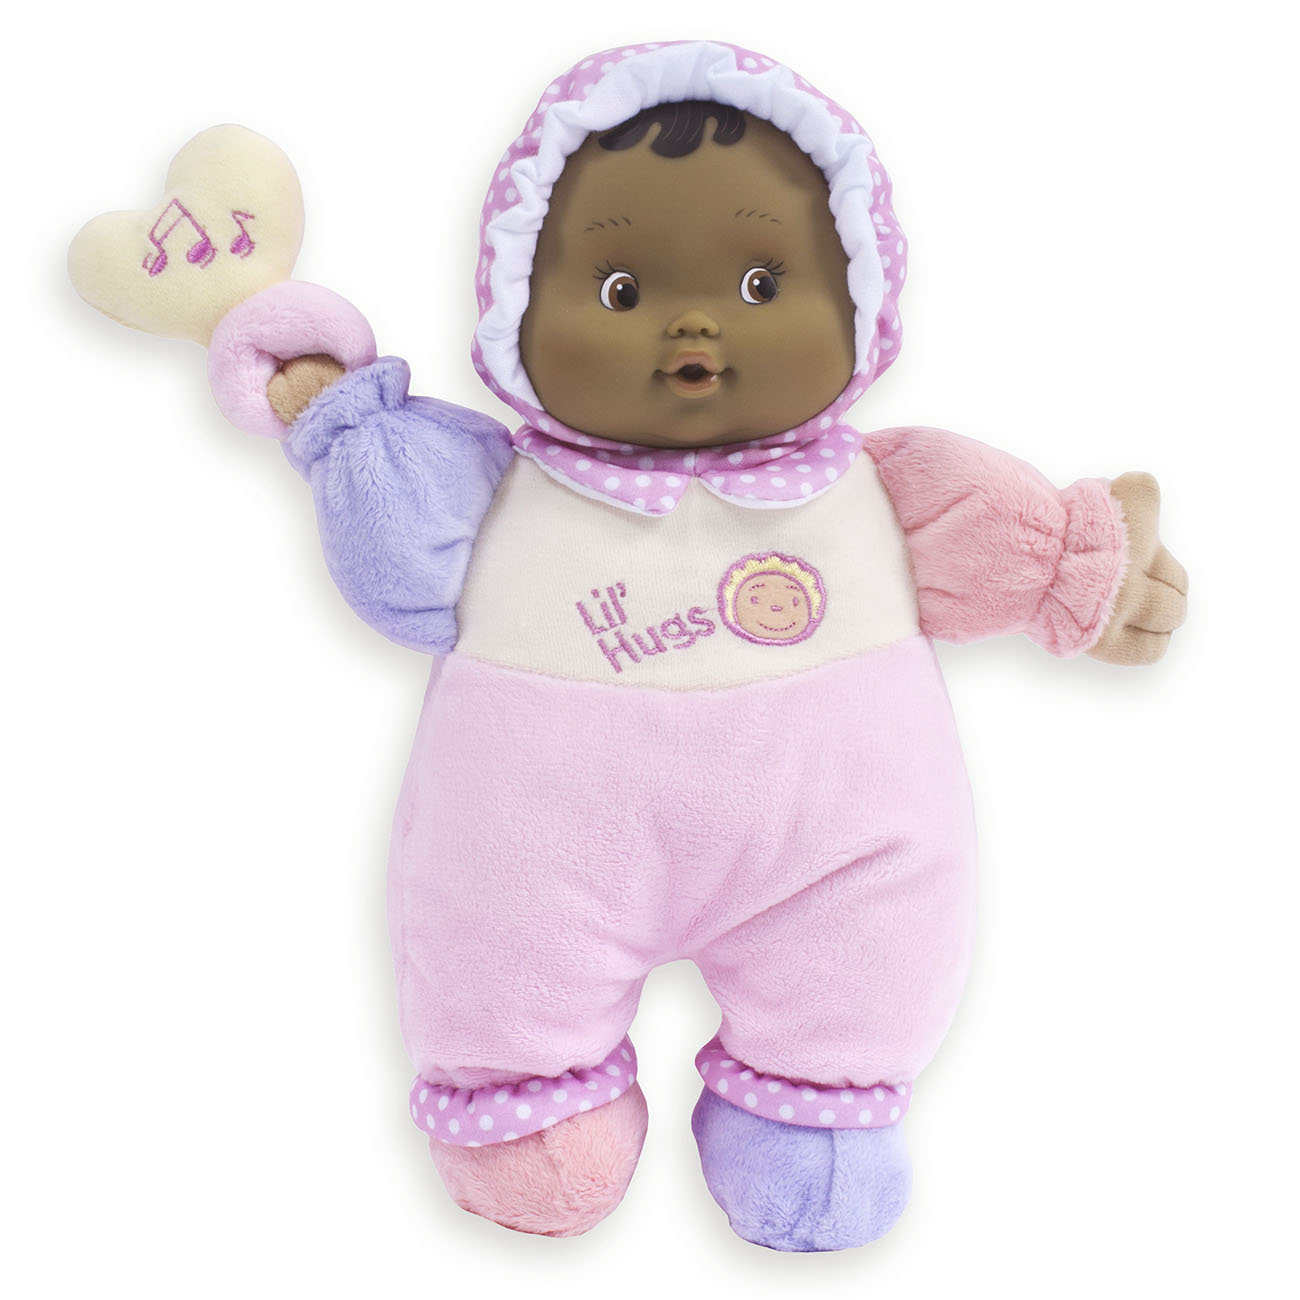 "JC Toys Berenguer 12"" Lil' Hugs Baby Doll"